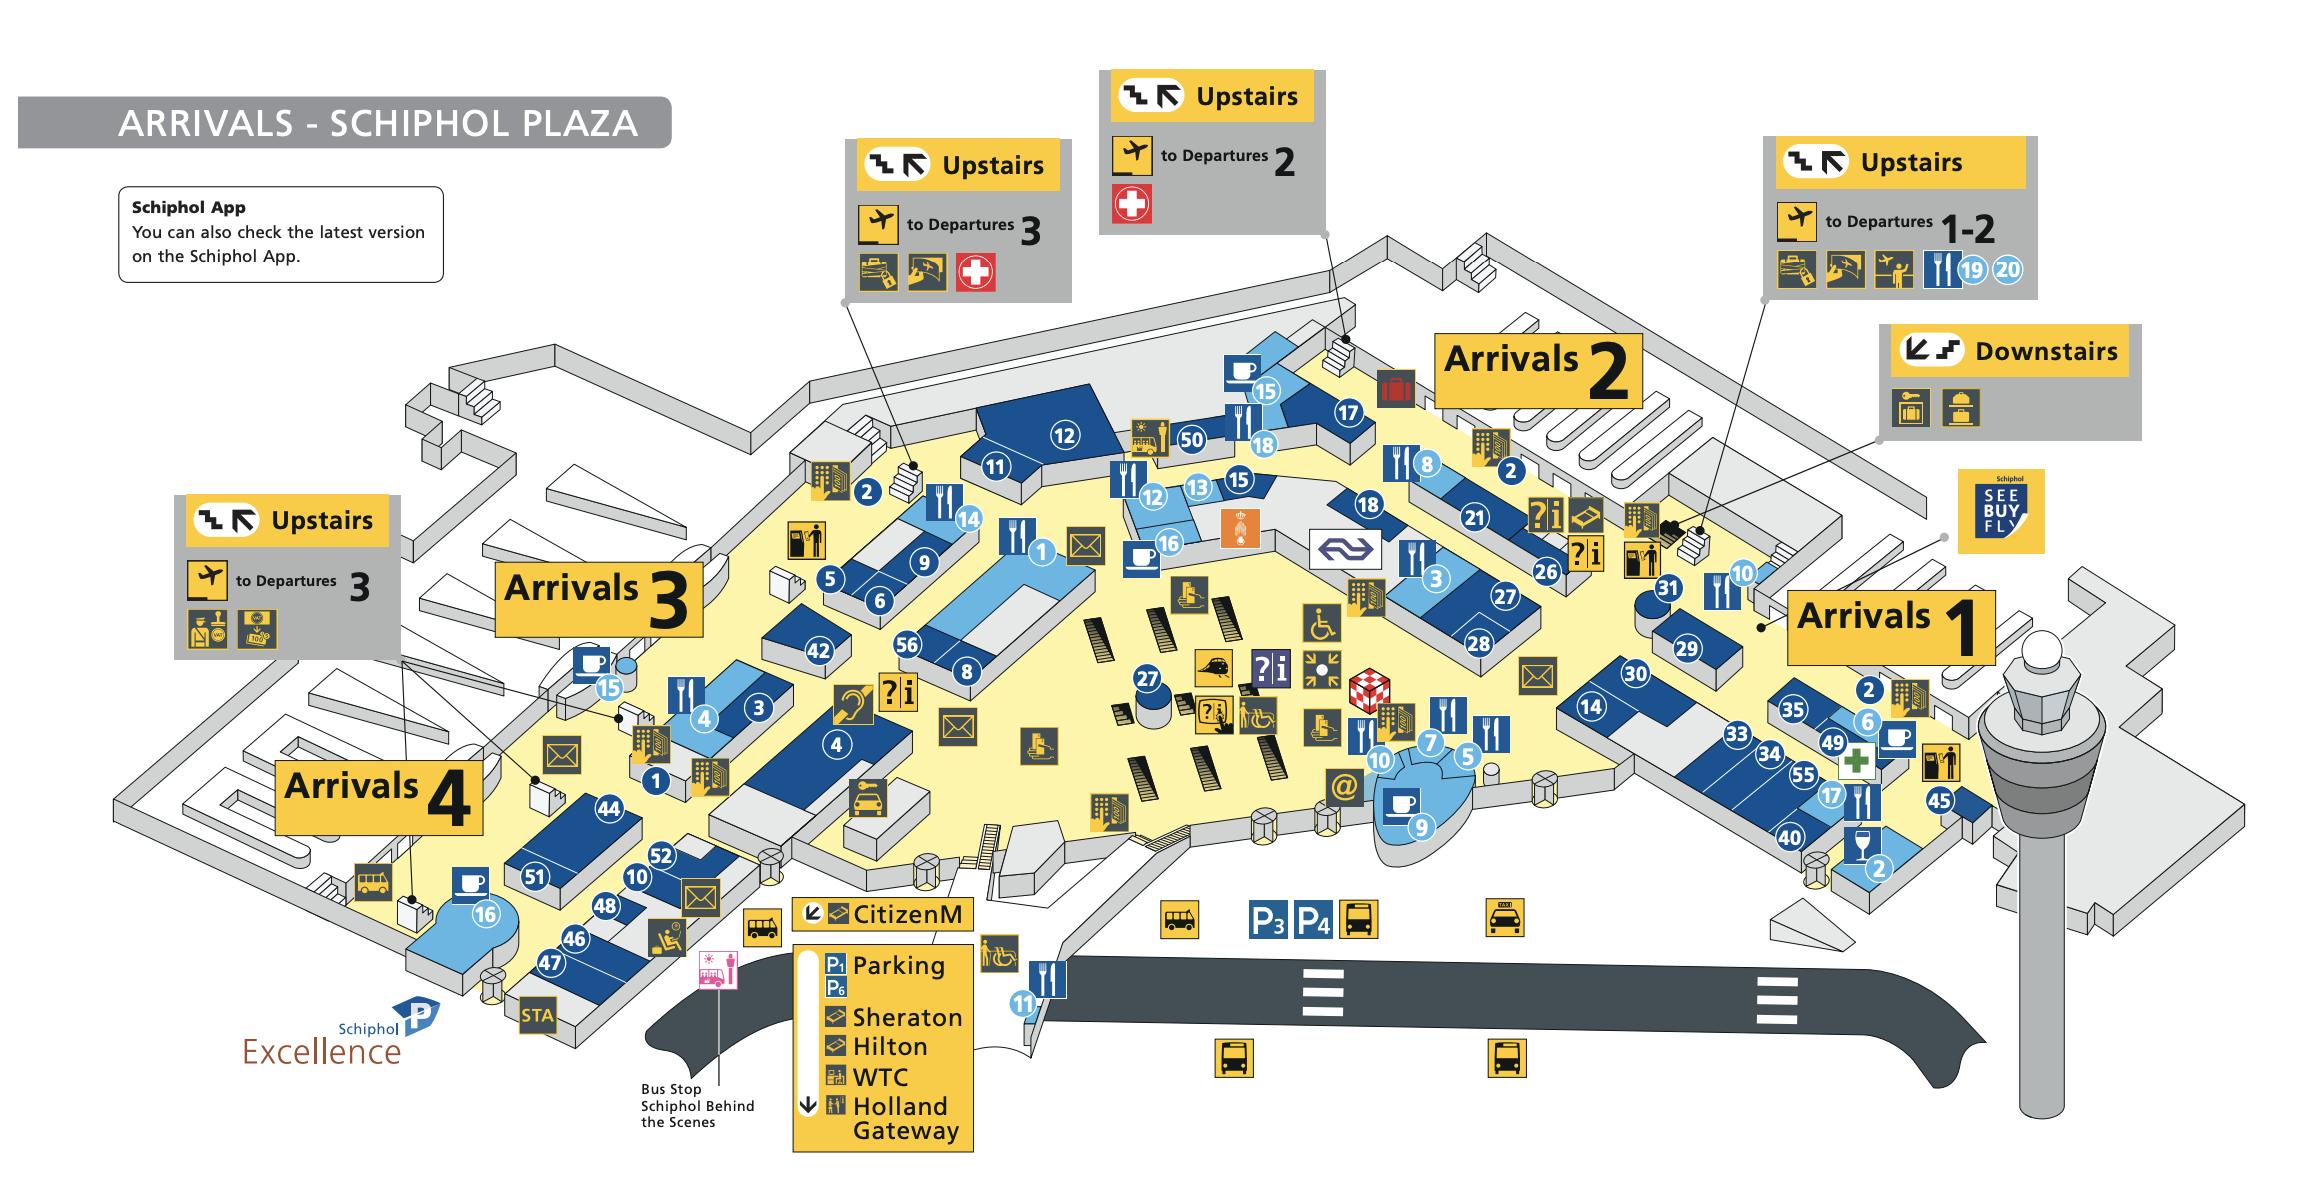 amsterdam schiphol airport map Amsterdam Airport Schiphol Arrivals Map Tulip Festival Amsterdam amsterdam schiphol airport map